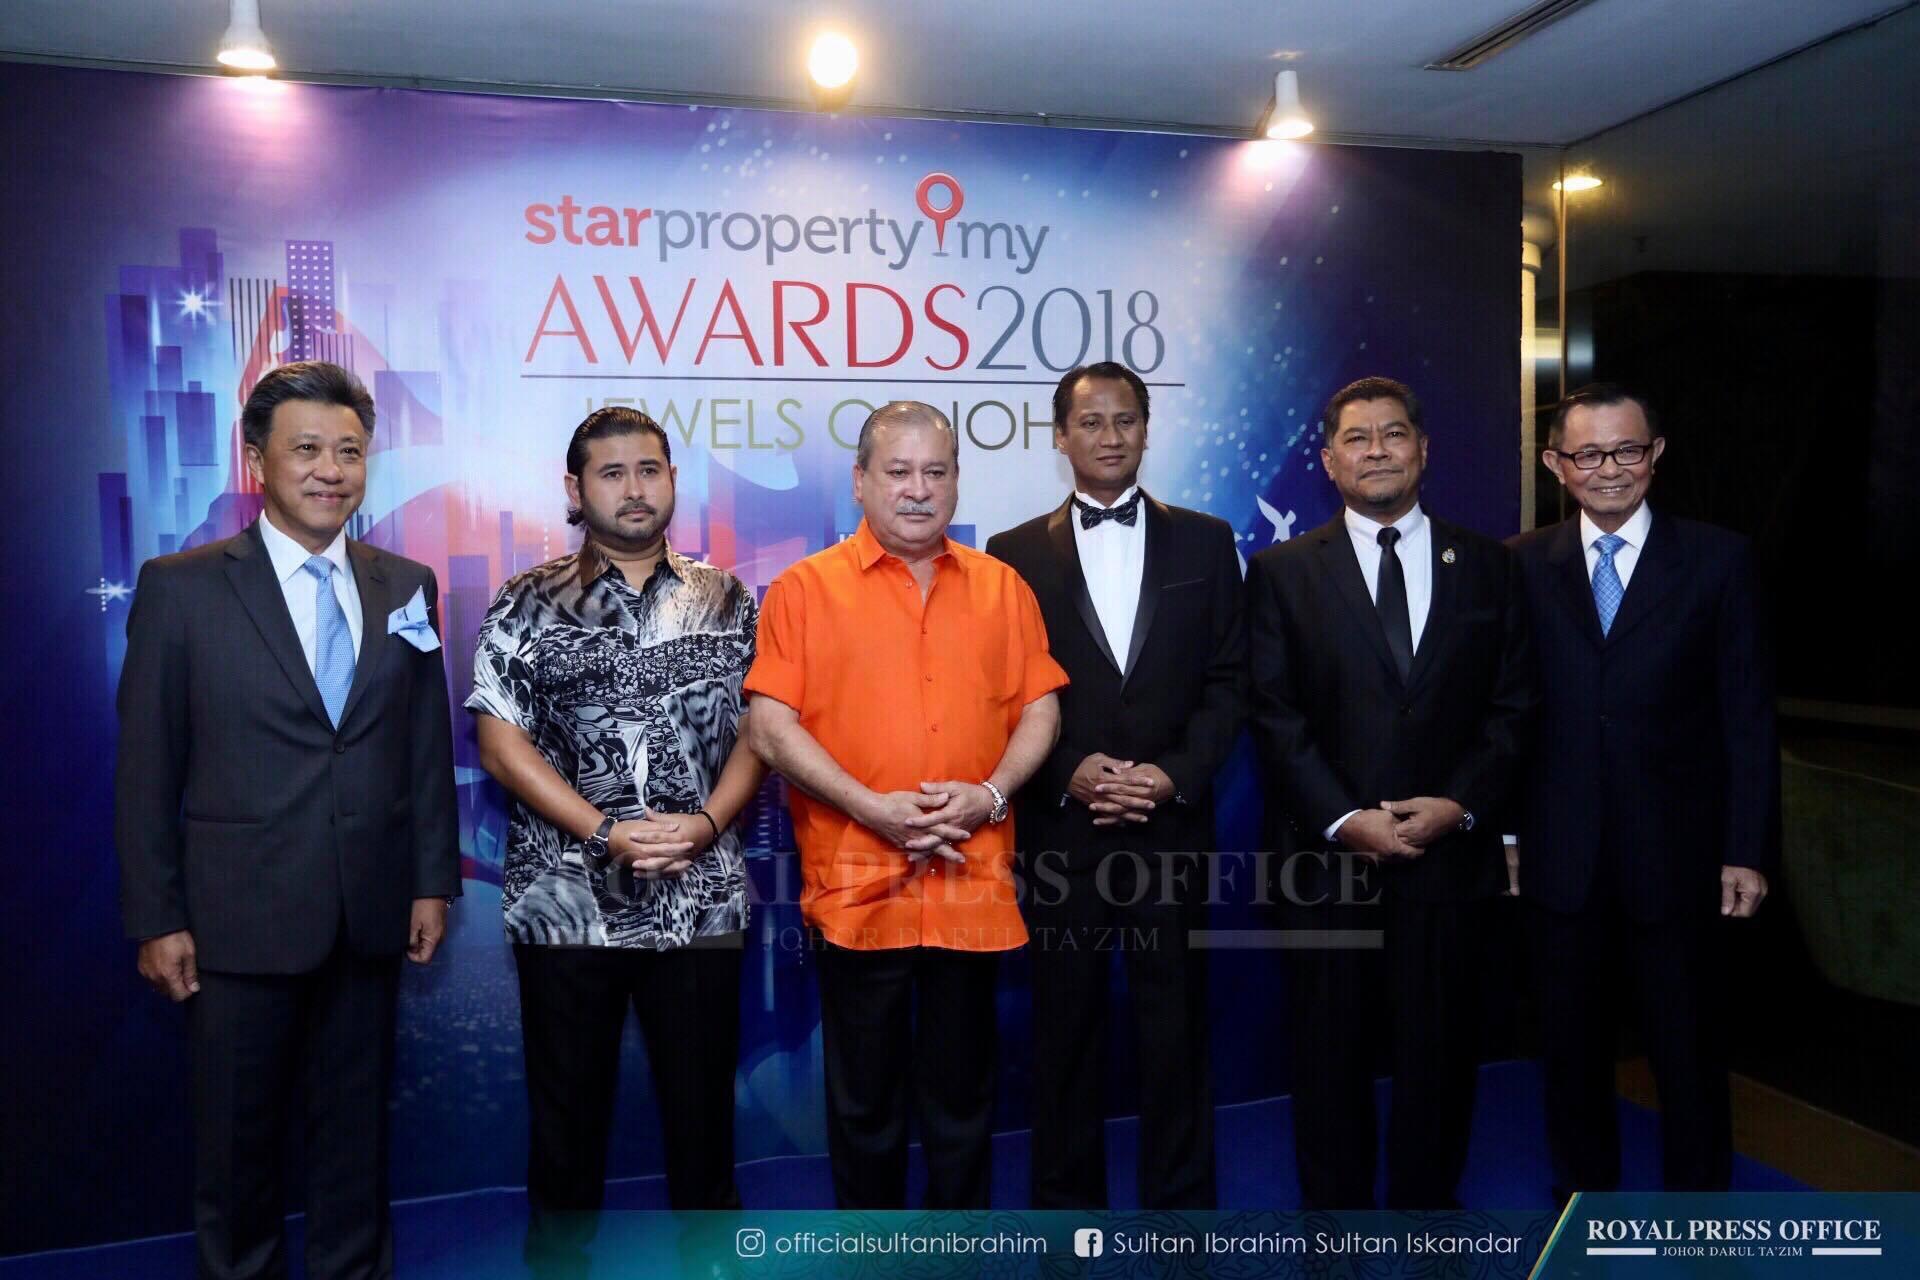 Johor ruler Sultan Ibrahim Sultan Iskandar (third left) and Tunku Mahkota Johor, Tunku Ismail Sultan Ibrahim (second left) at the 'StarProperty.my Awards 2018: Jewels of Johor'— Pictures via Facebook/Johor Royal Press Office